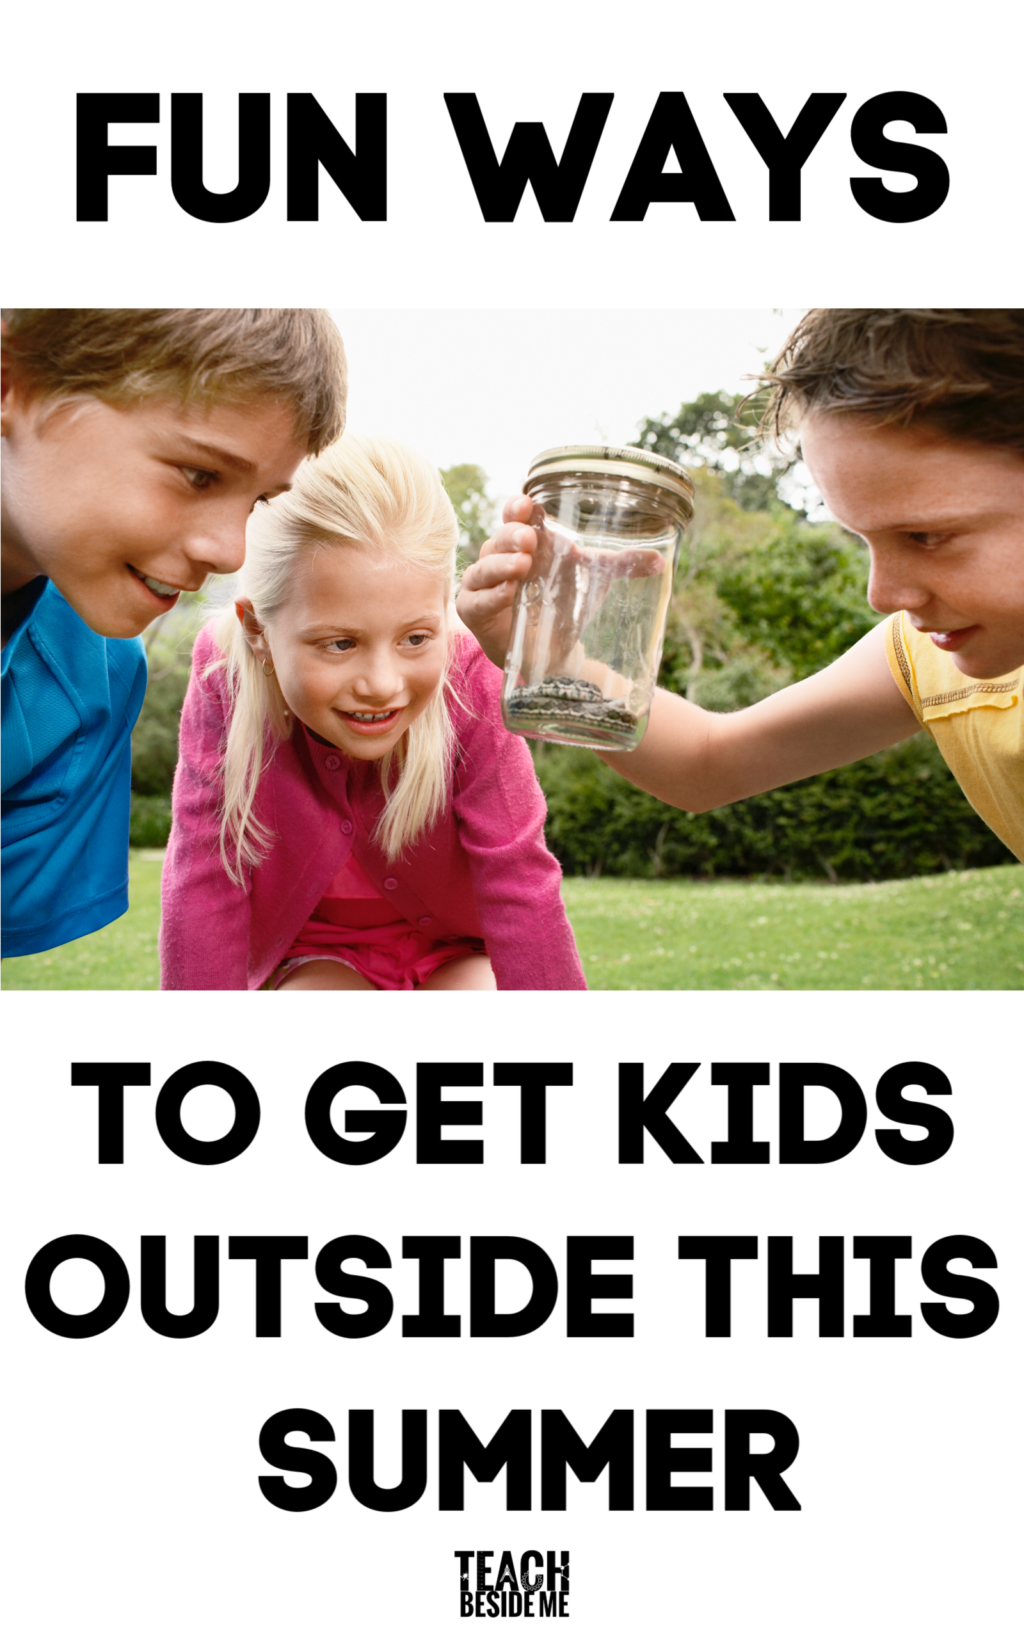 fun ways to get kids outside